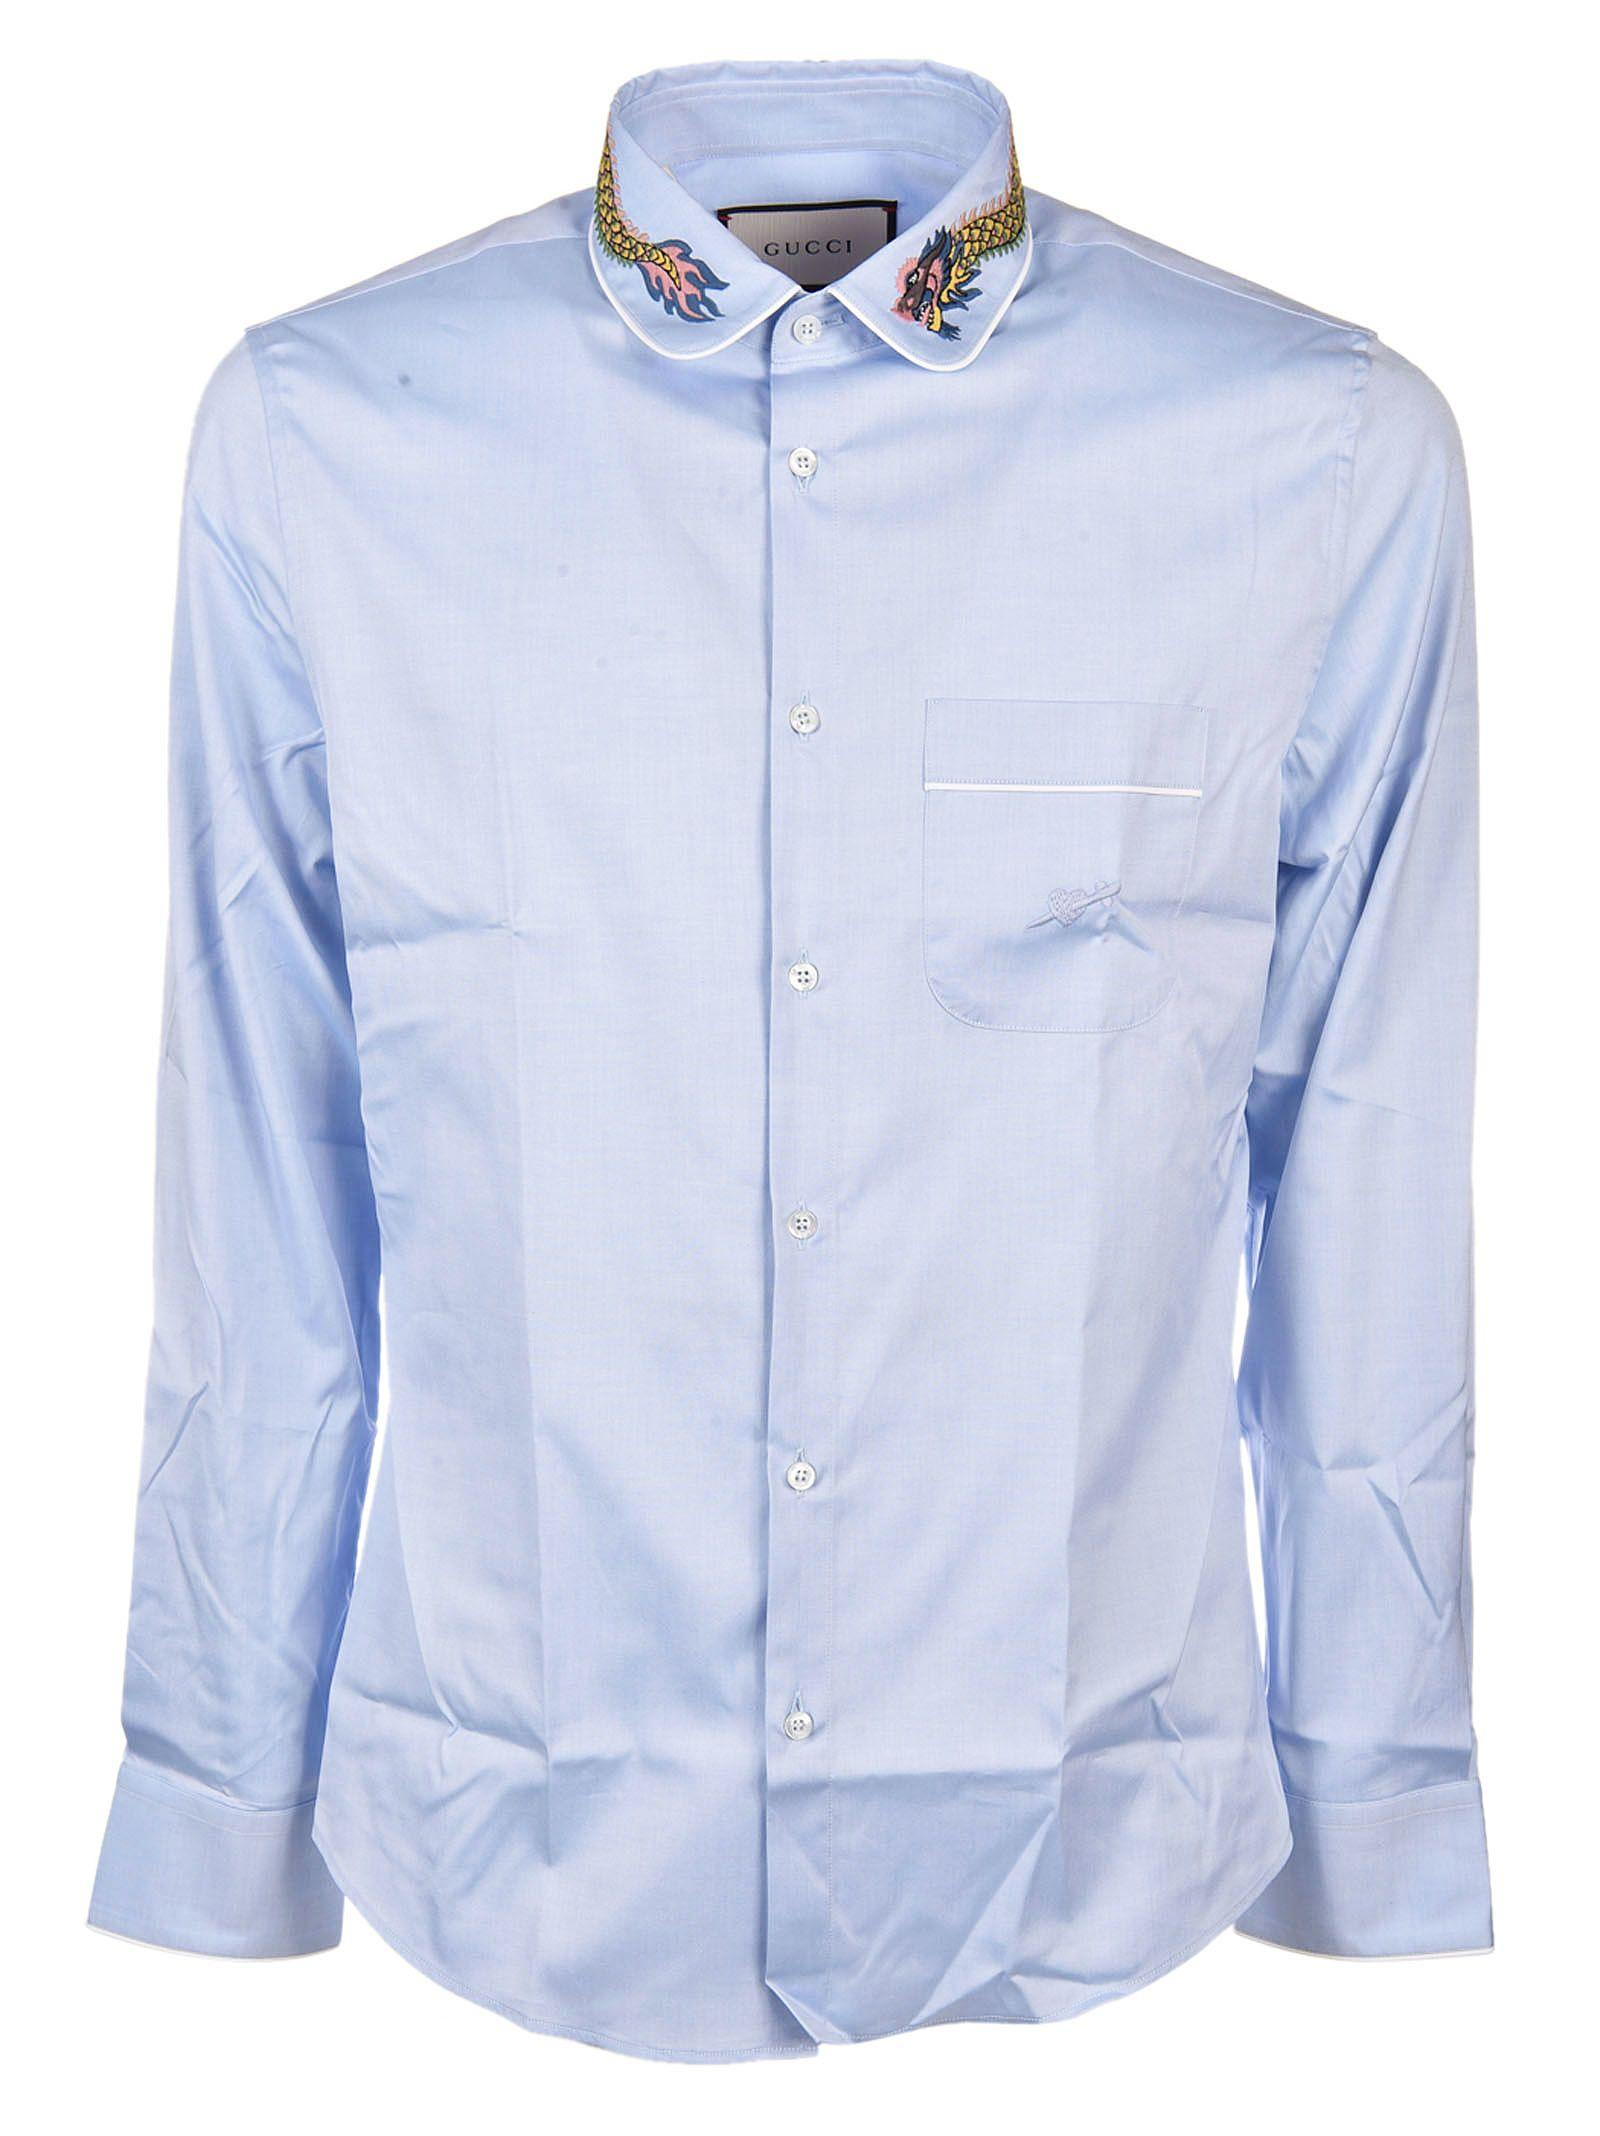 49052f9f Gucci Duke Tiger-Embroidered Shirt, Light Blue | ModeSens